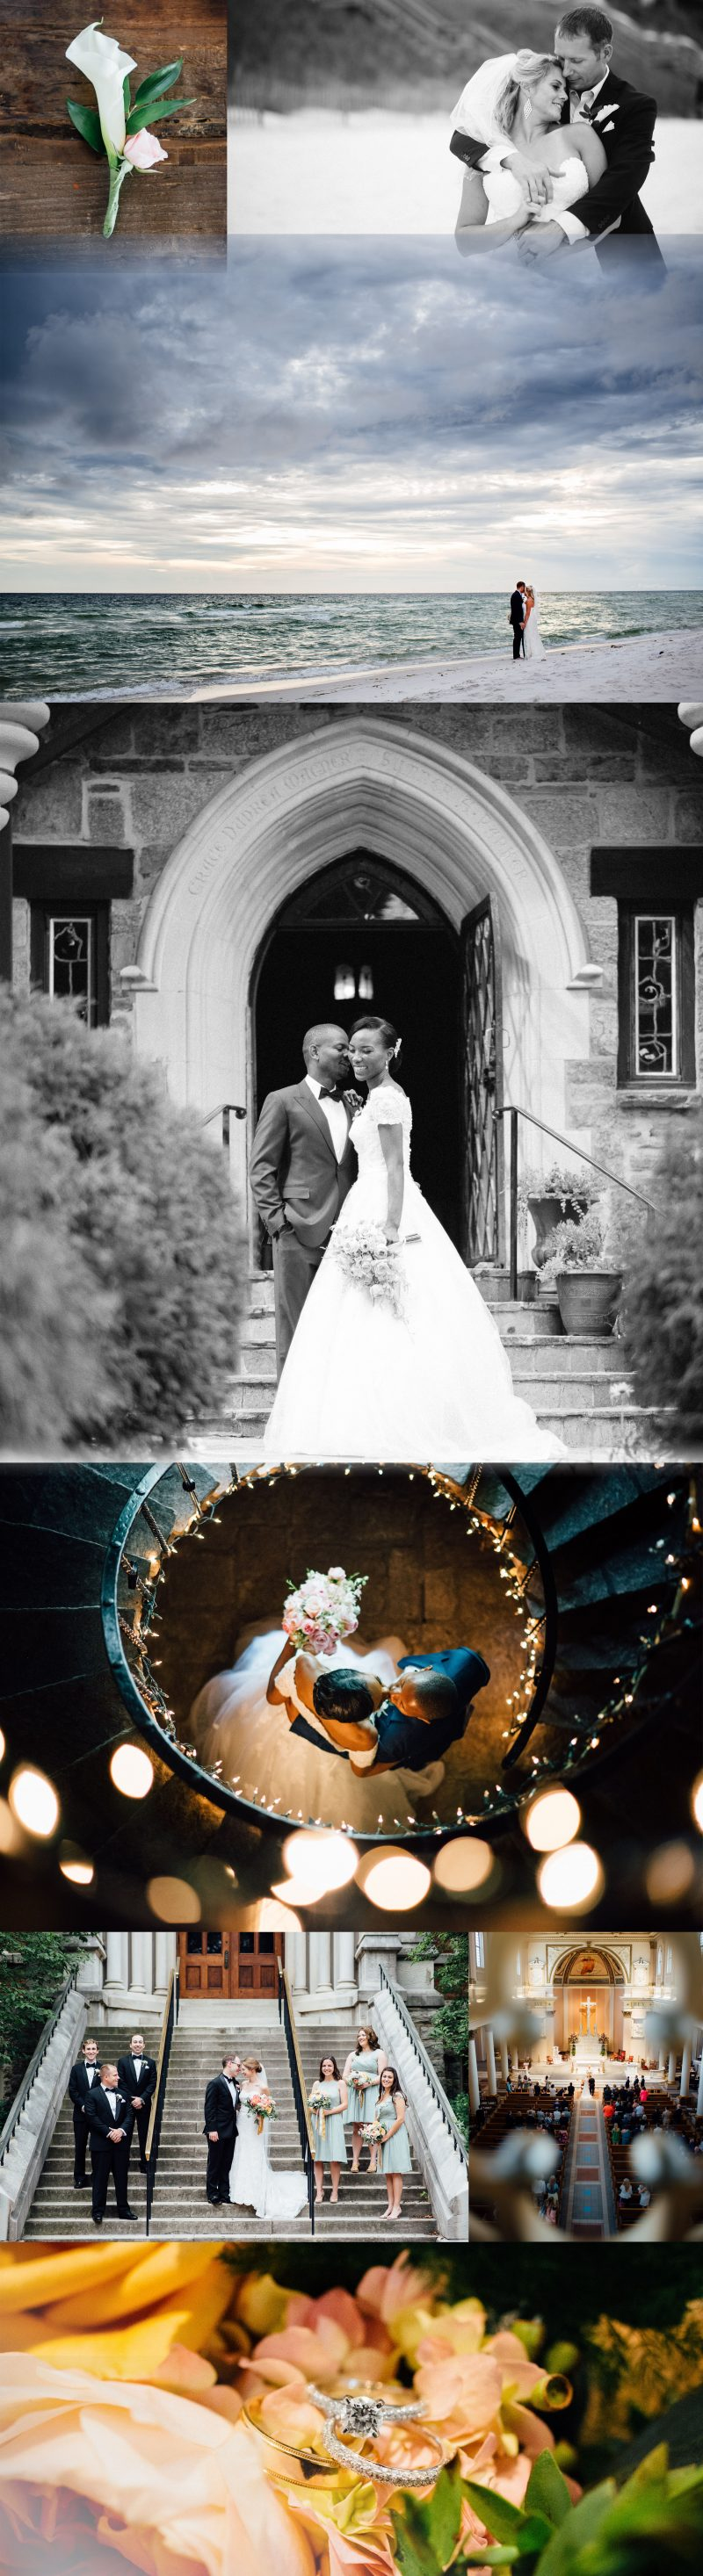 instagram2-1-800x2933 Best of Weddings 2016